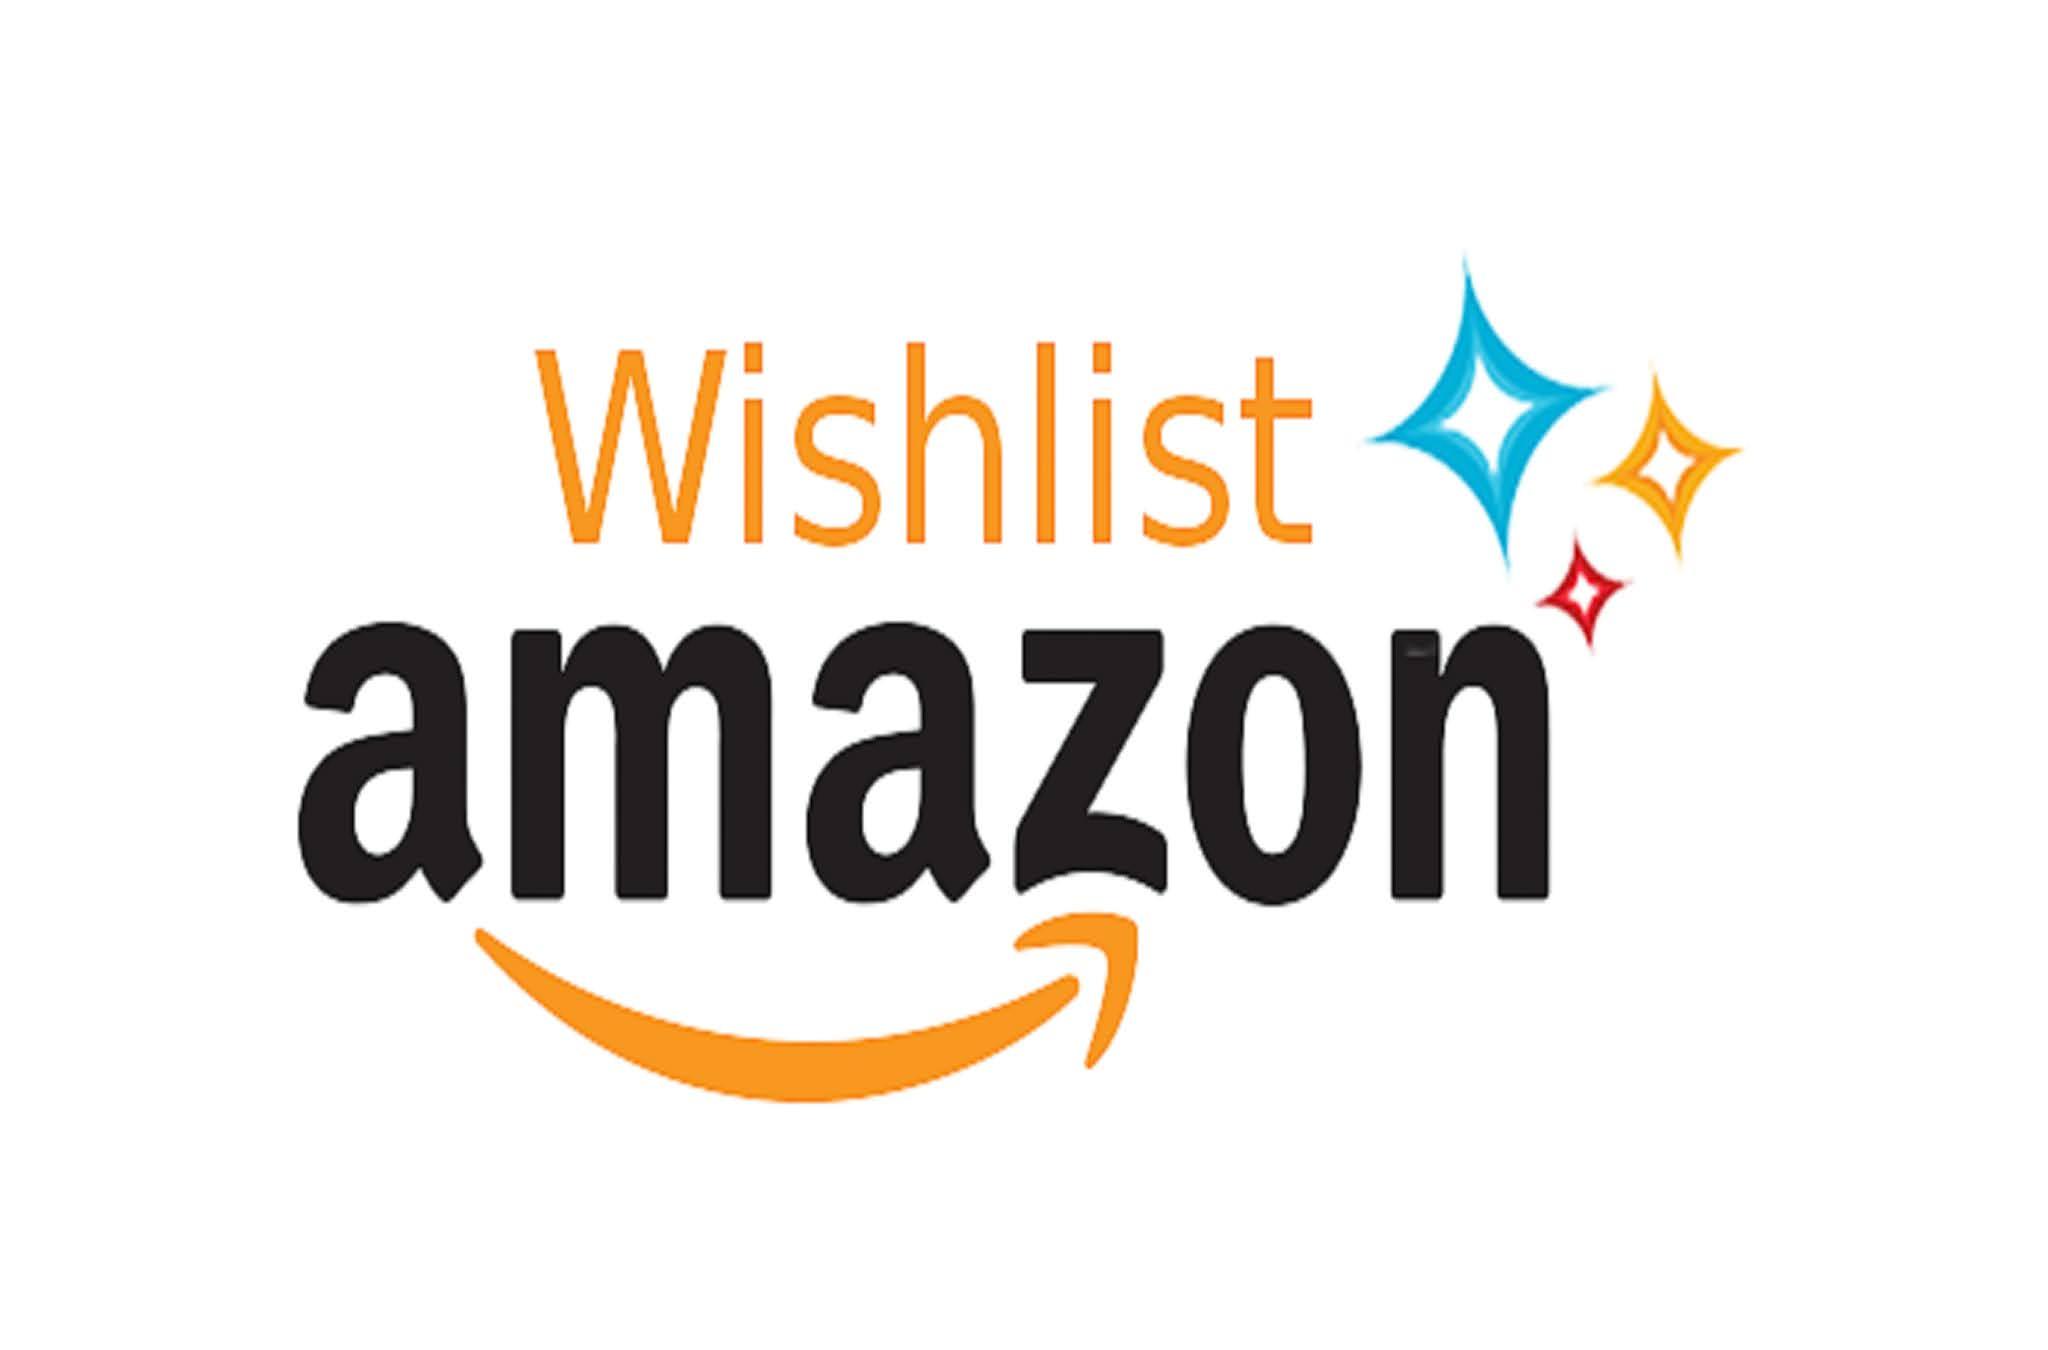 Amazon wish list logo